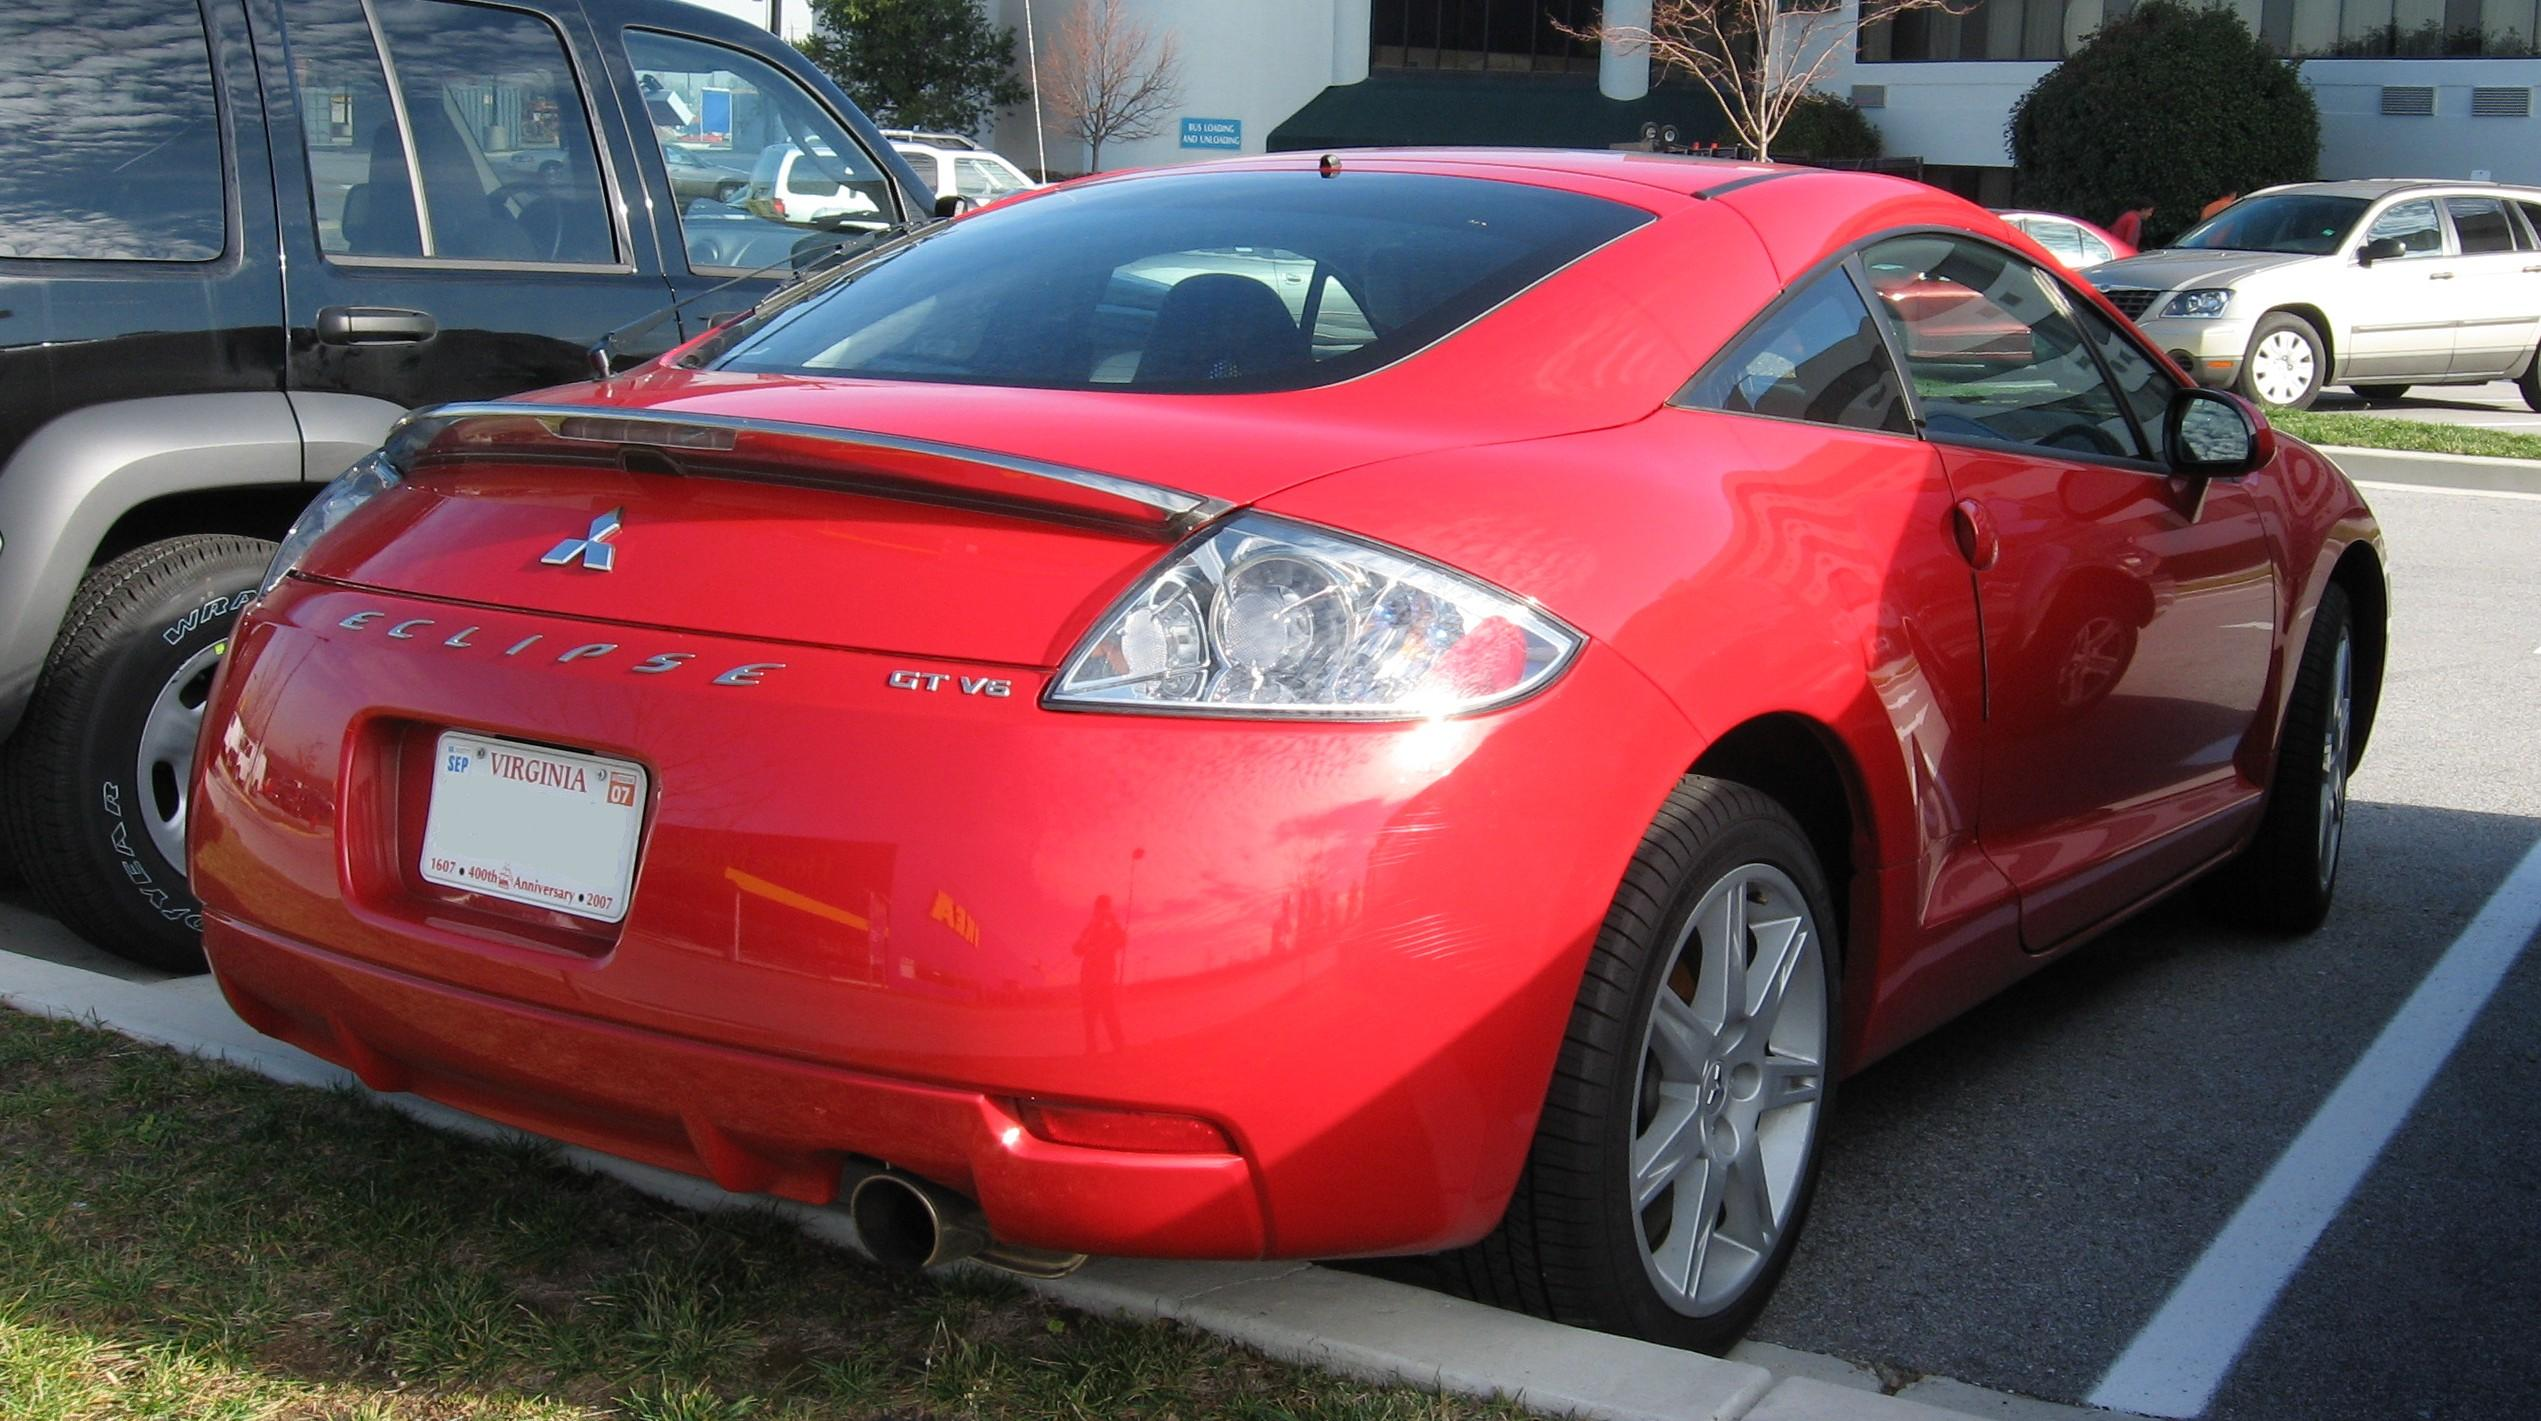 06-Mitsubishi-Eclipse-rear